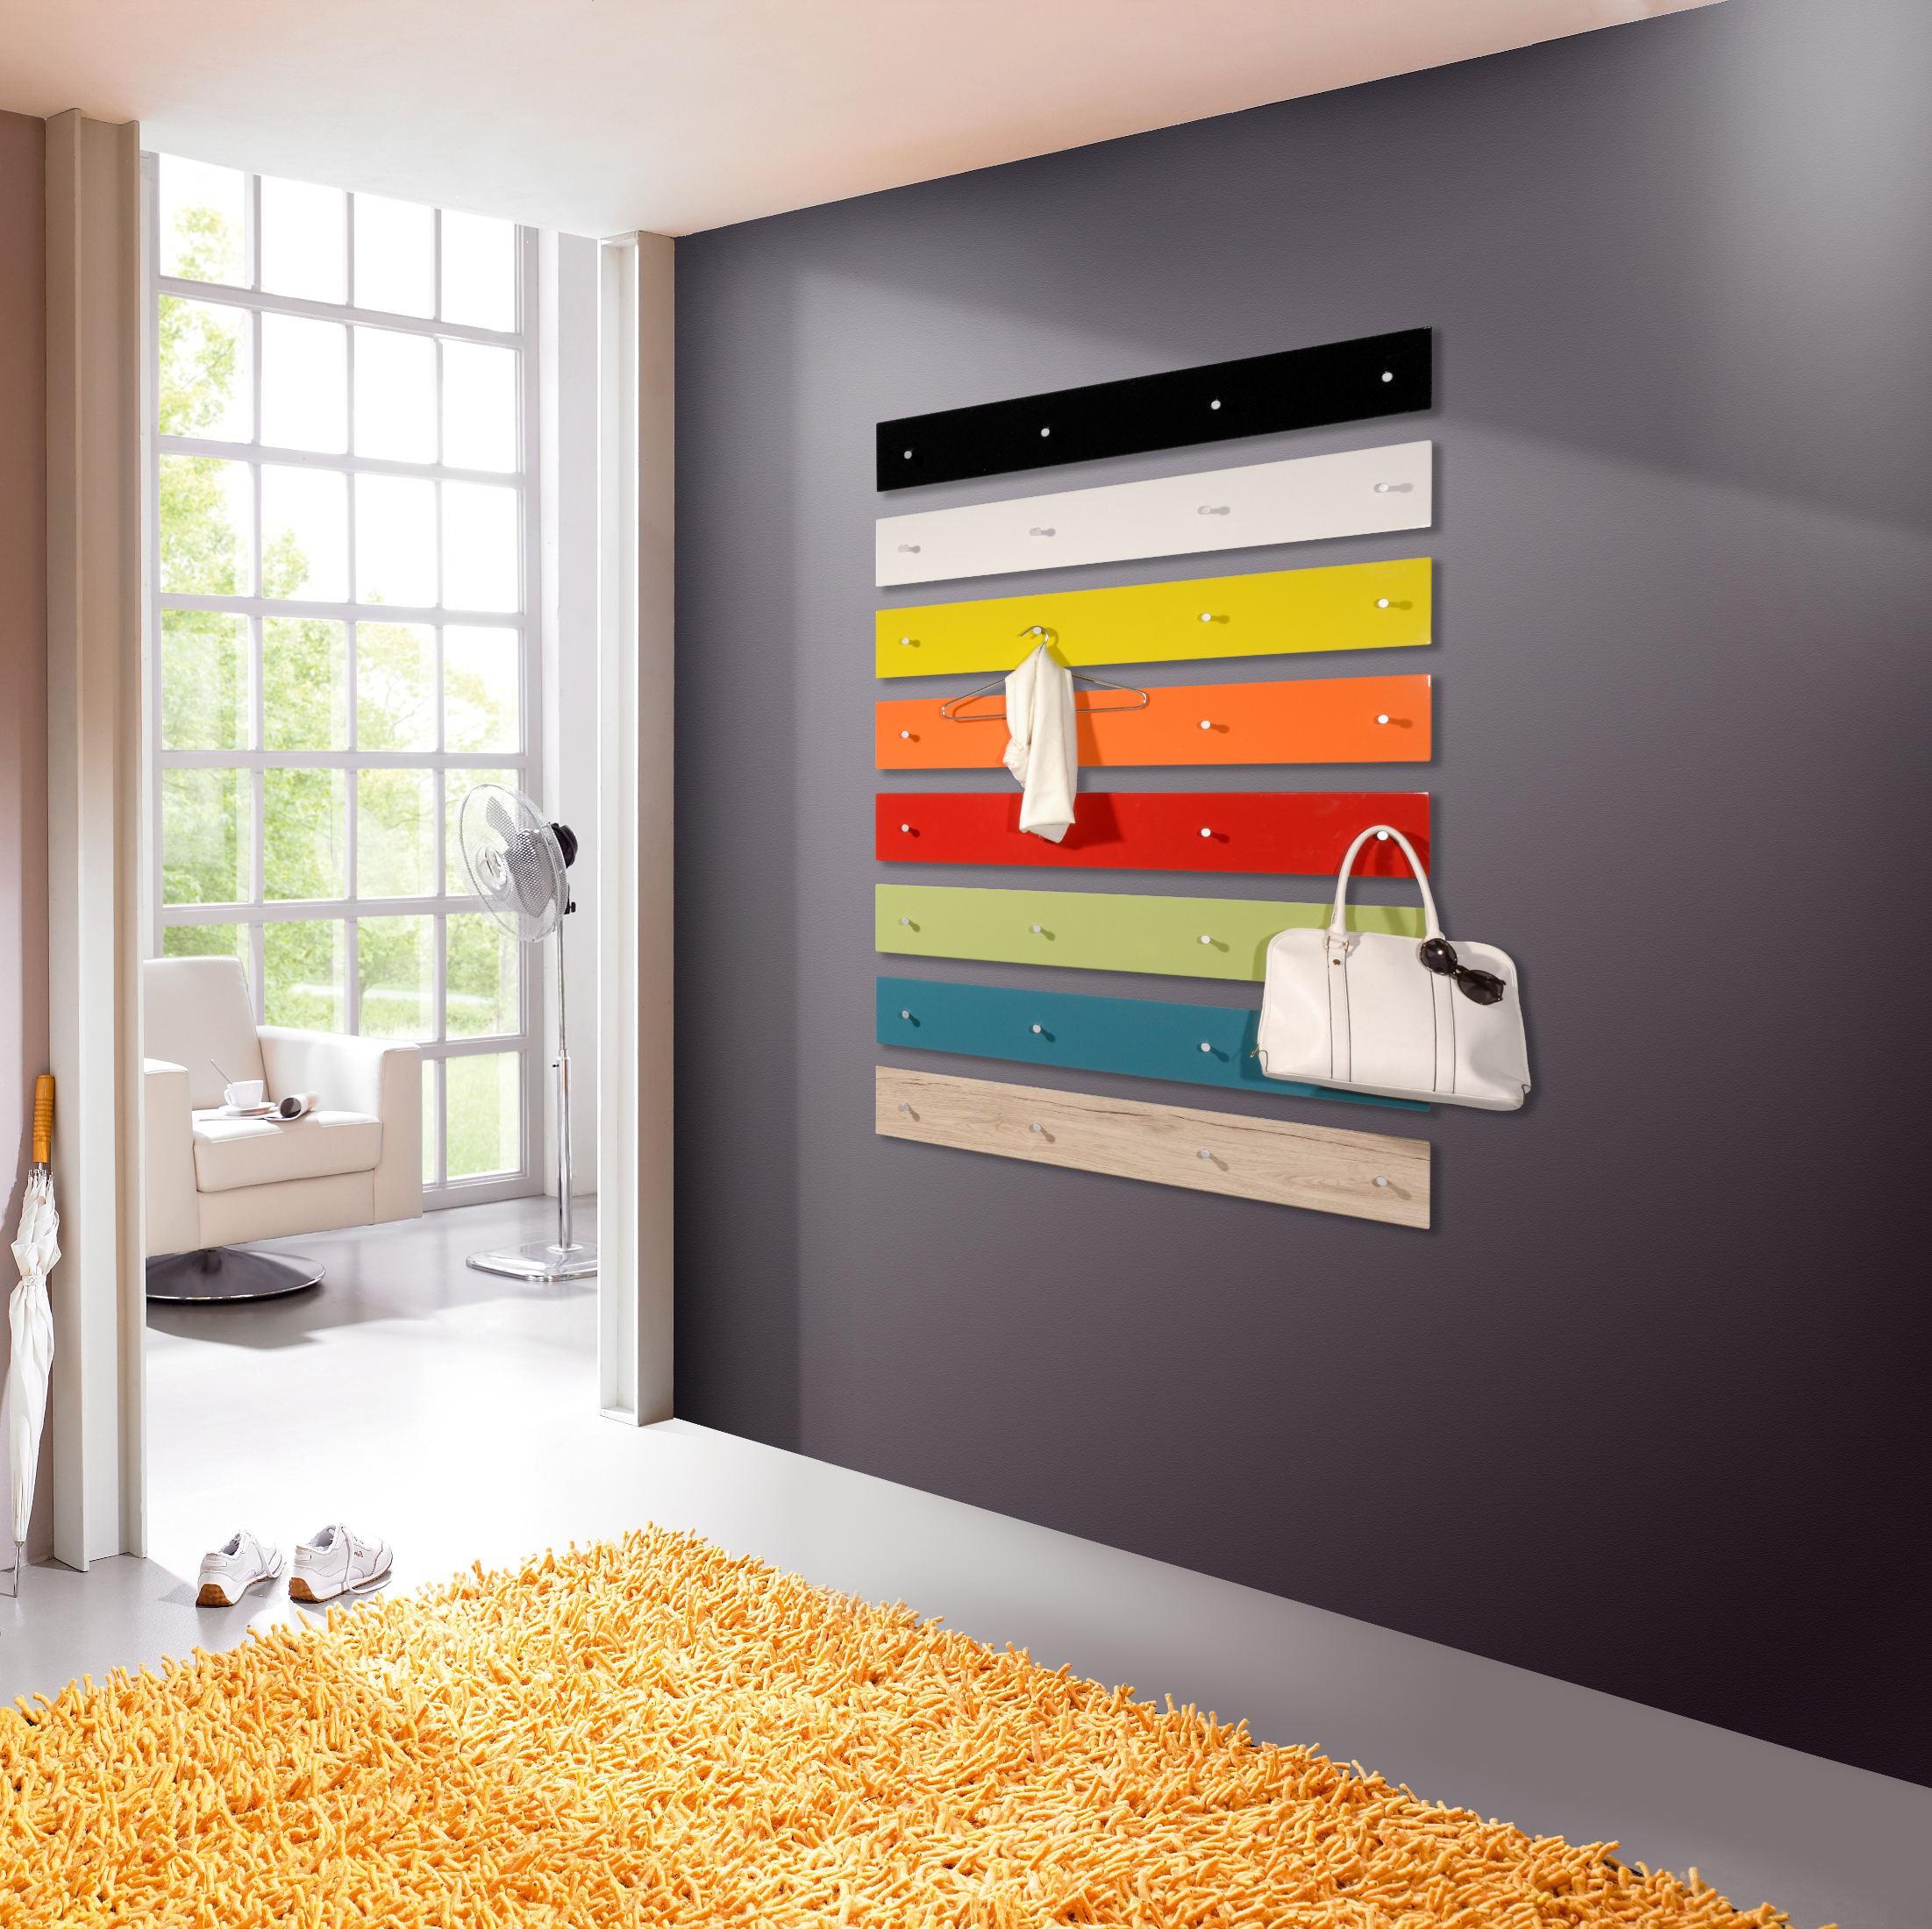 Garderobenpaneel potpourri diele flurgarderobe wandpaneel for Garderobenpaneel schwarz hochglanz